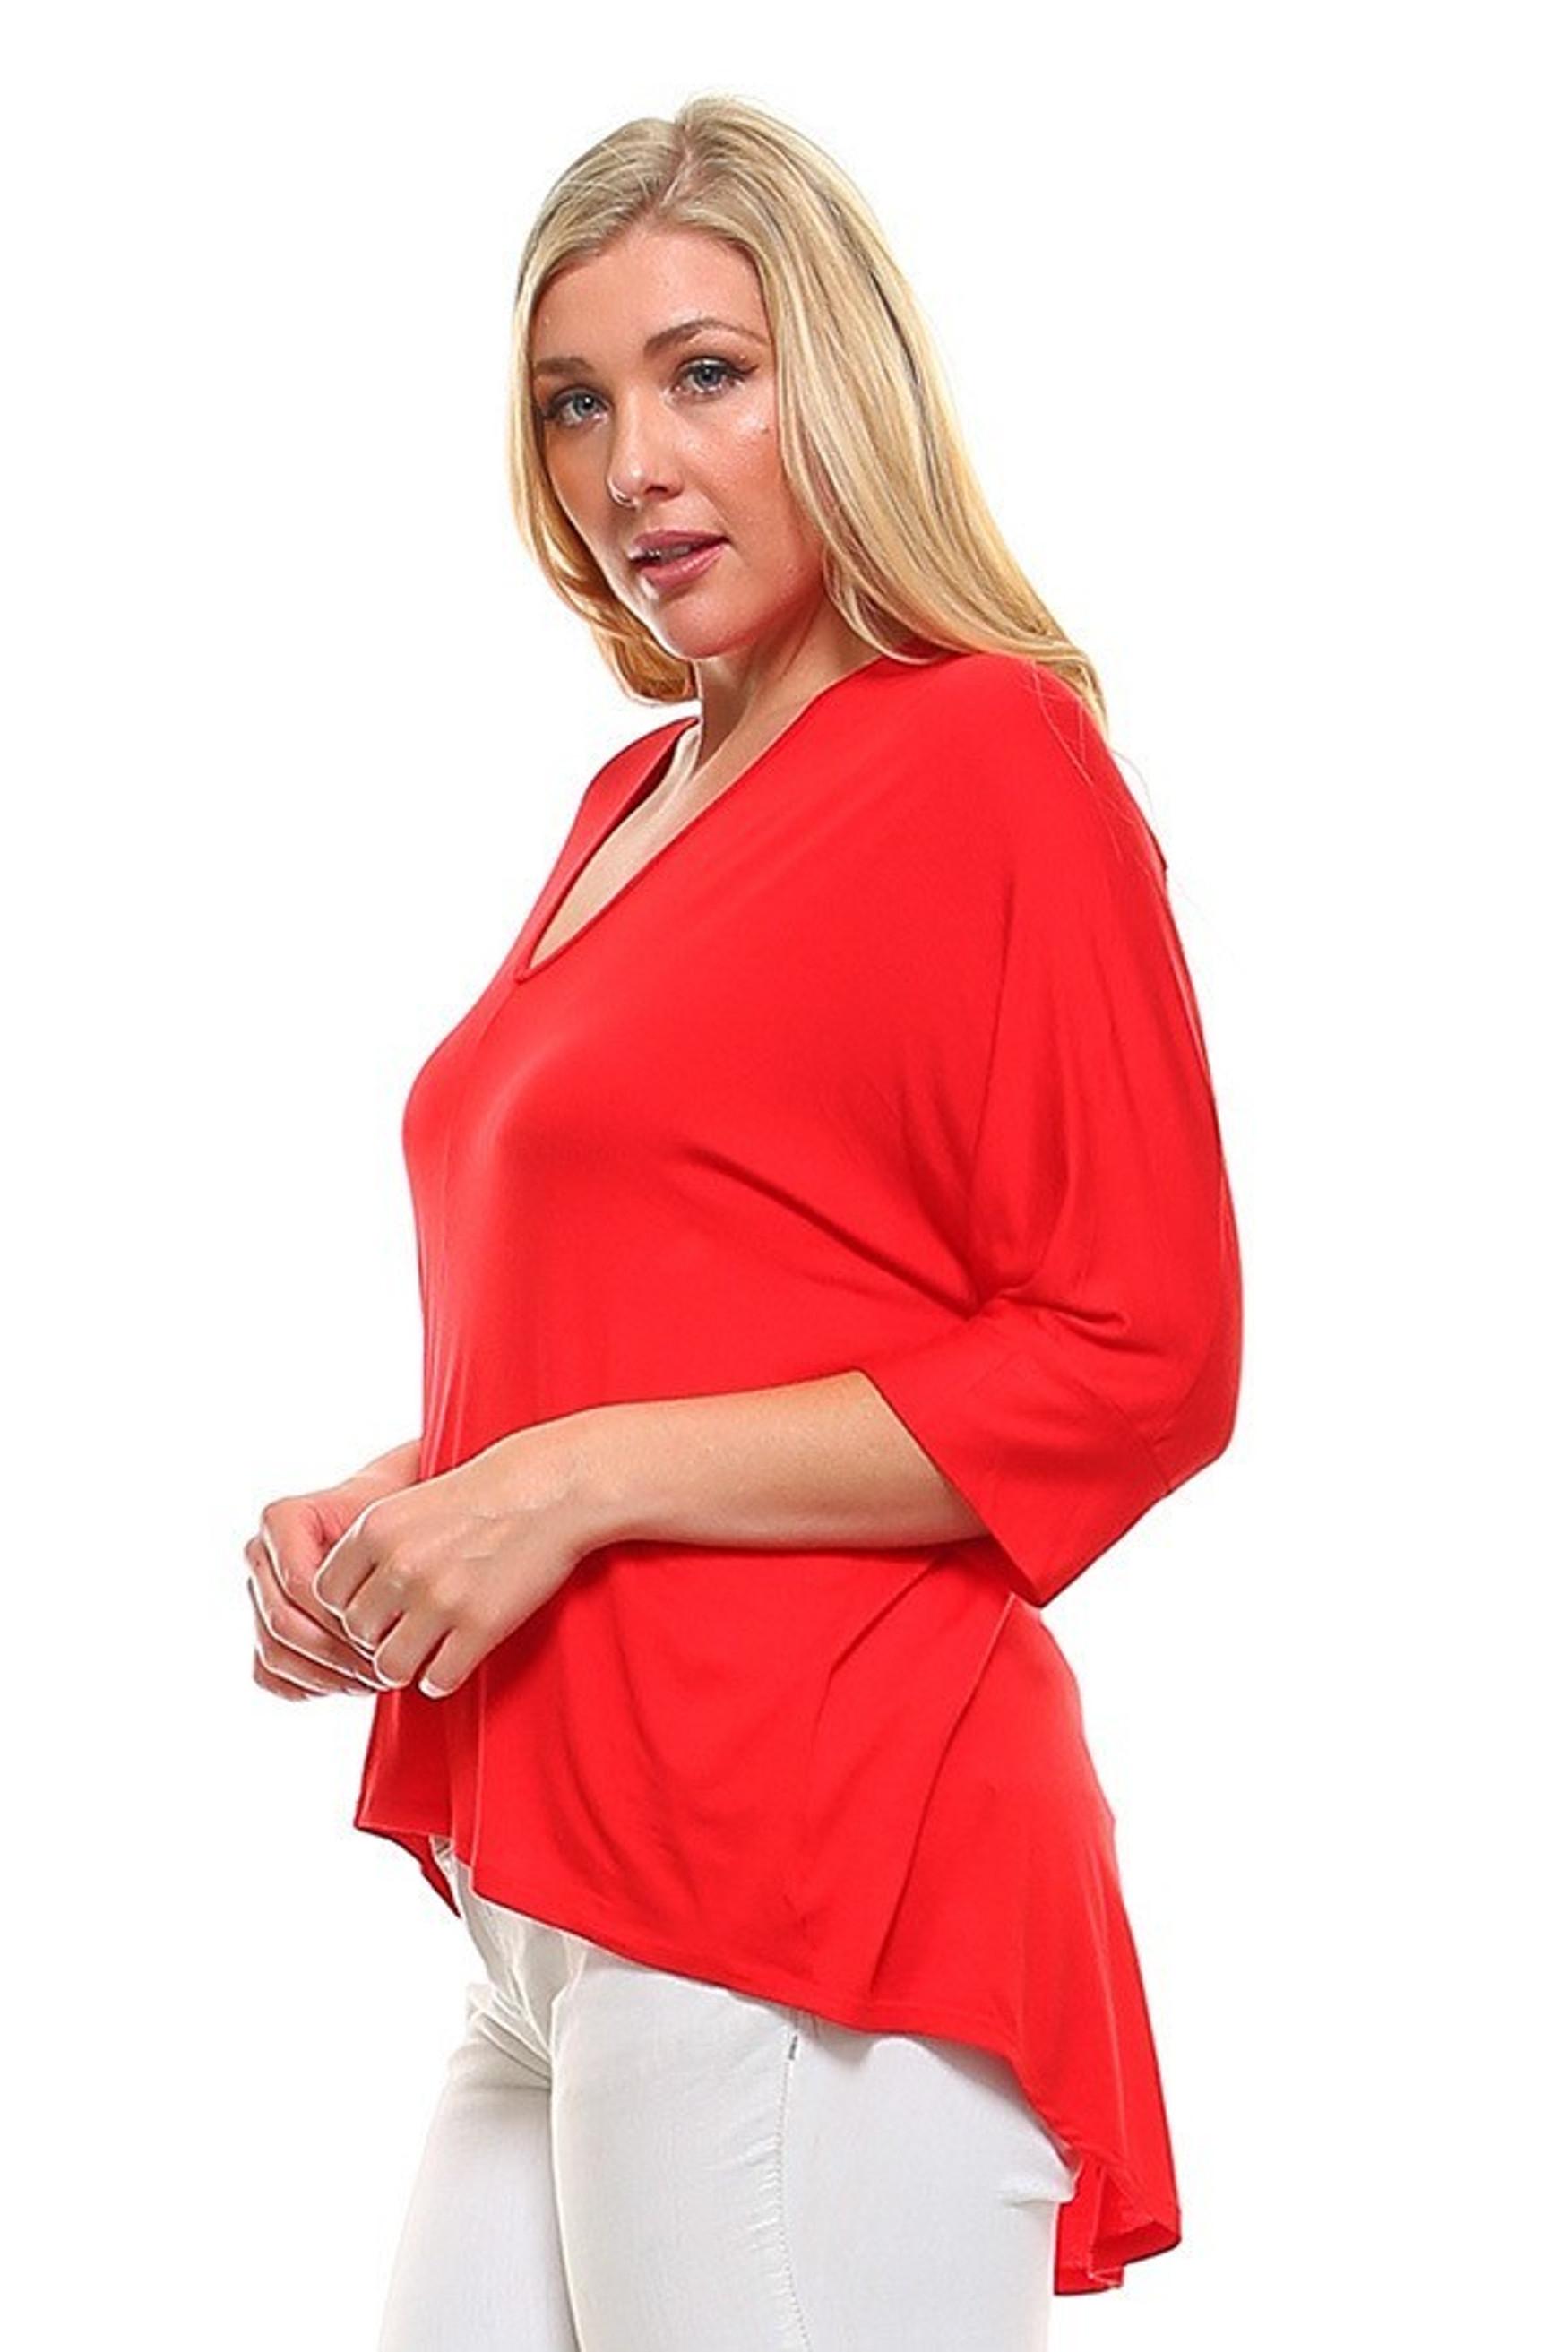 V-Neck 3/4 Sleeve High-Low Hem Rayon Plus Size Top